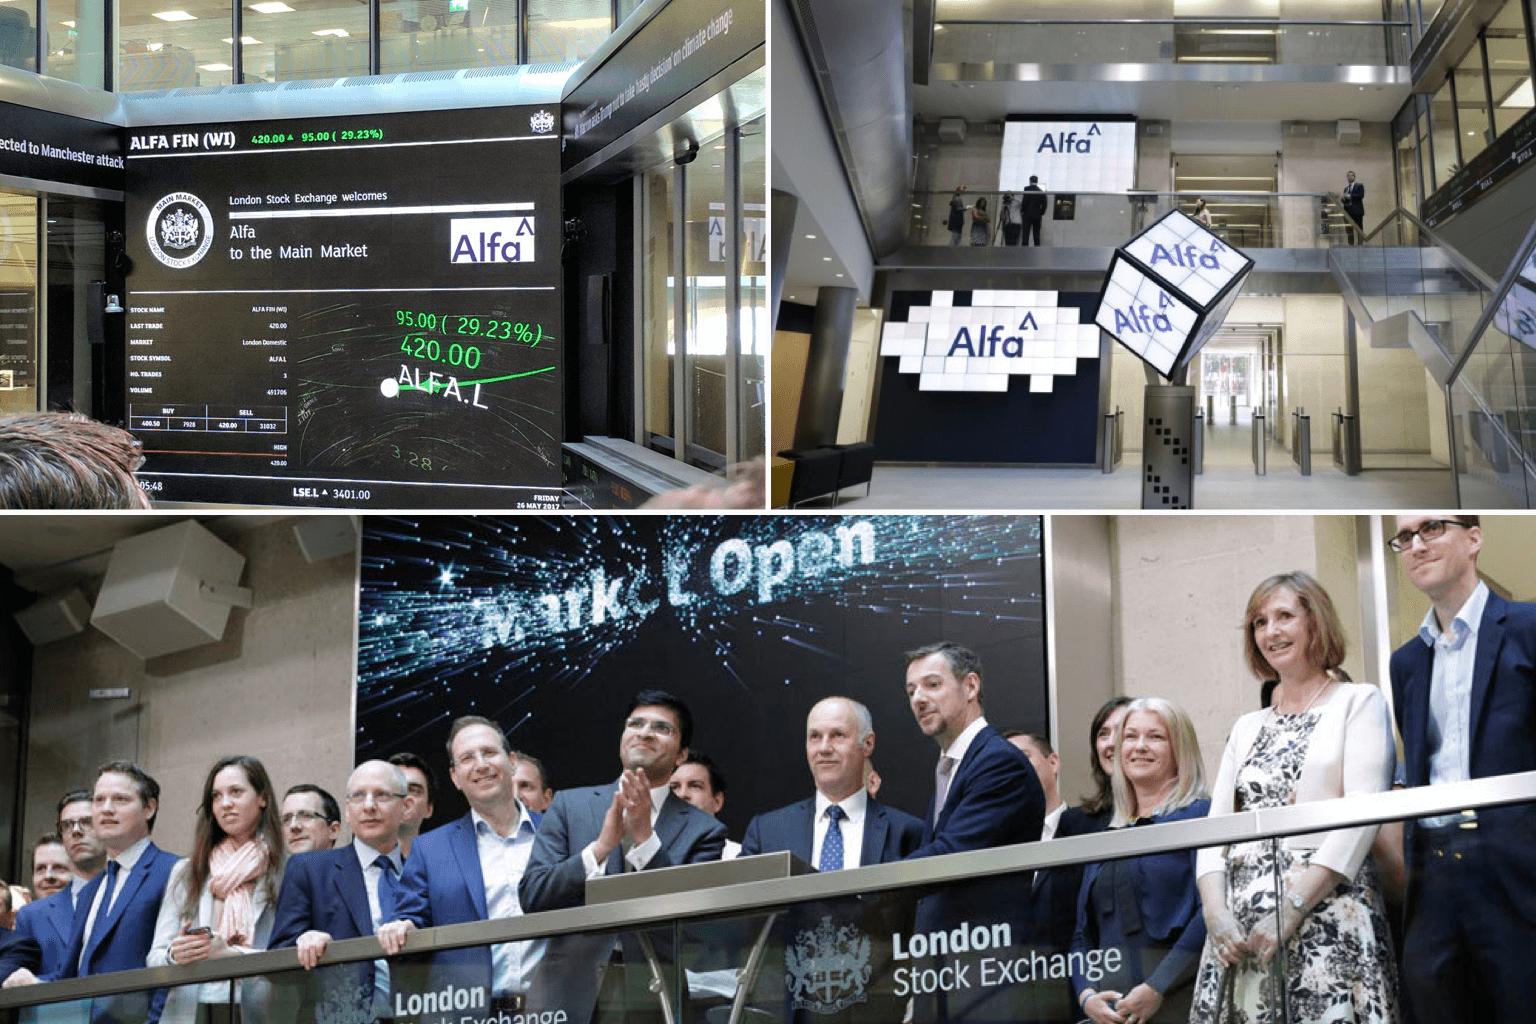 Alfa Investor Relations London Stock Exchange Float